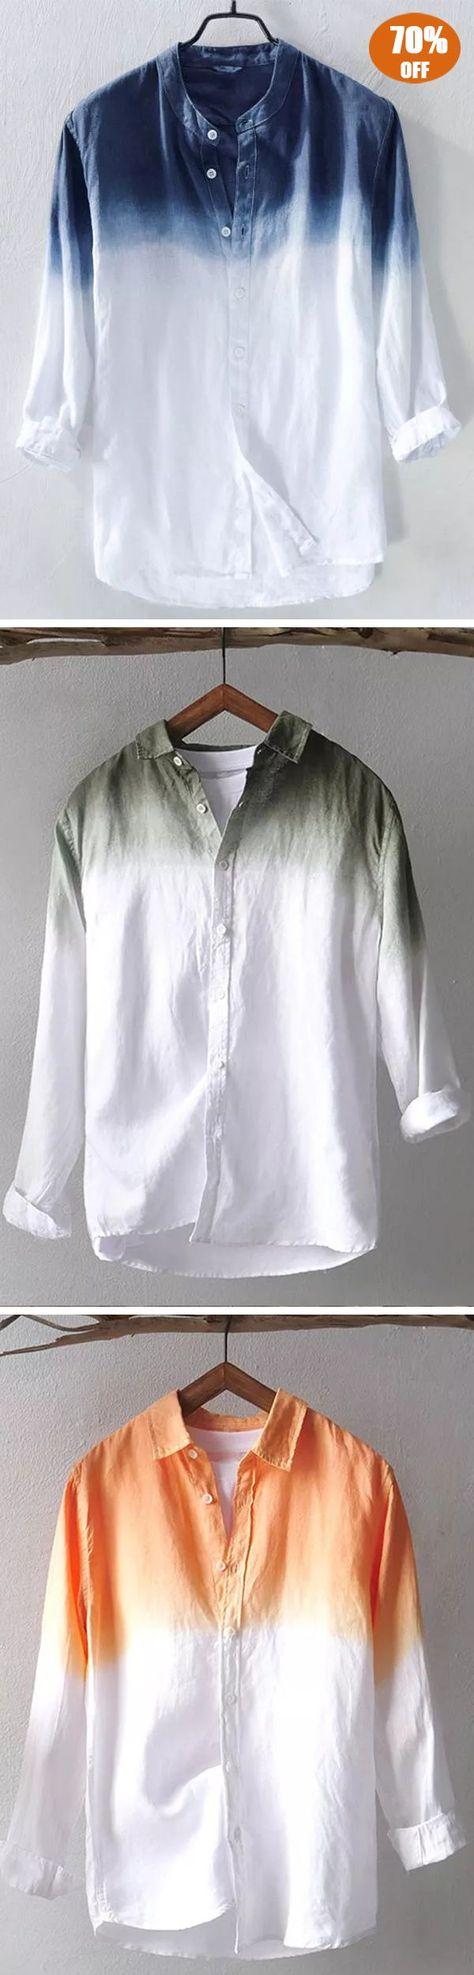 Arilce Goldwing-Retro Men Polo Shirt Short Sleeve Lapel Blouse Black